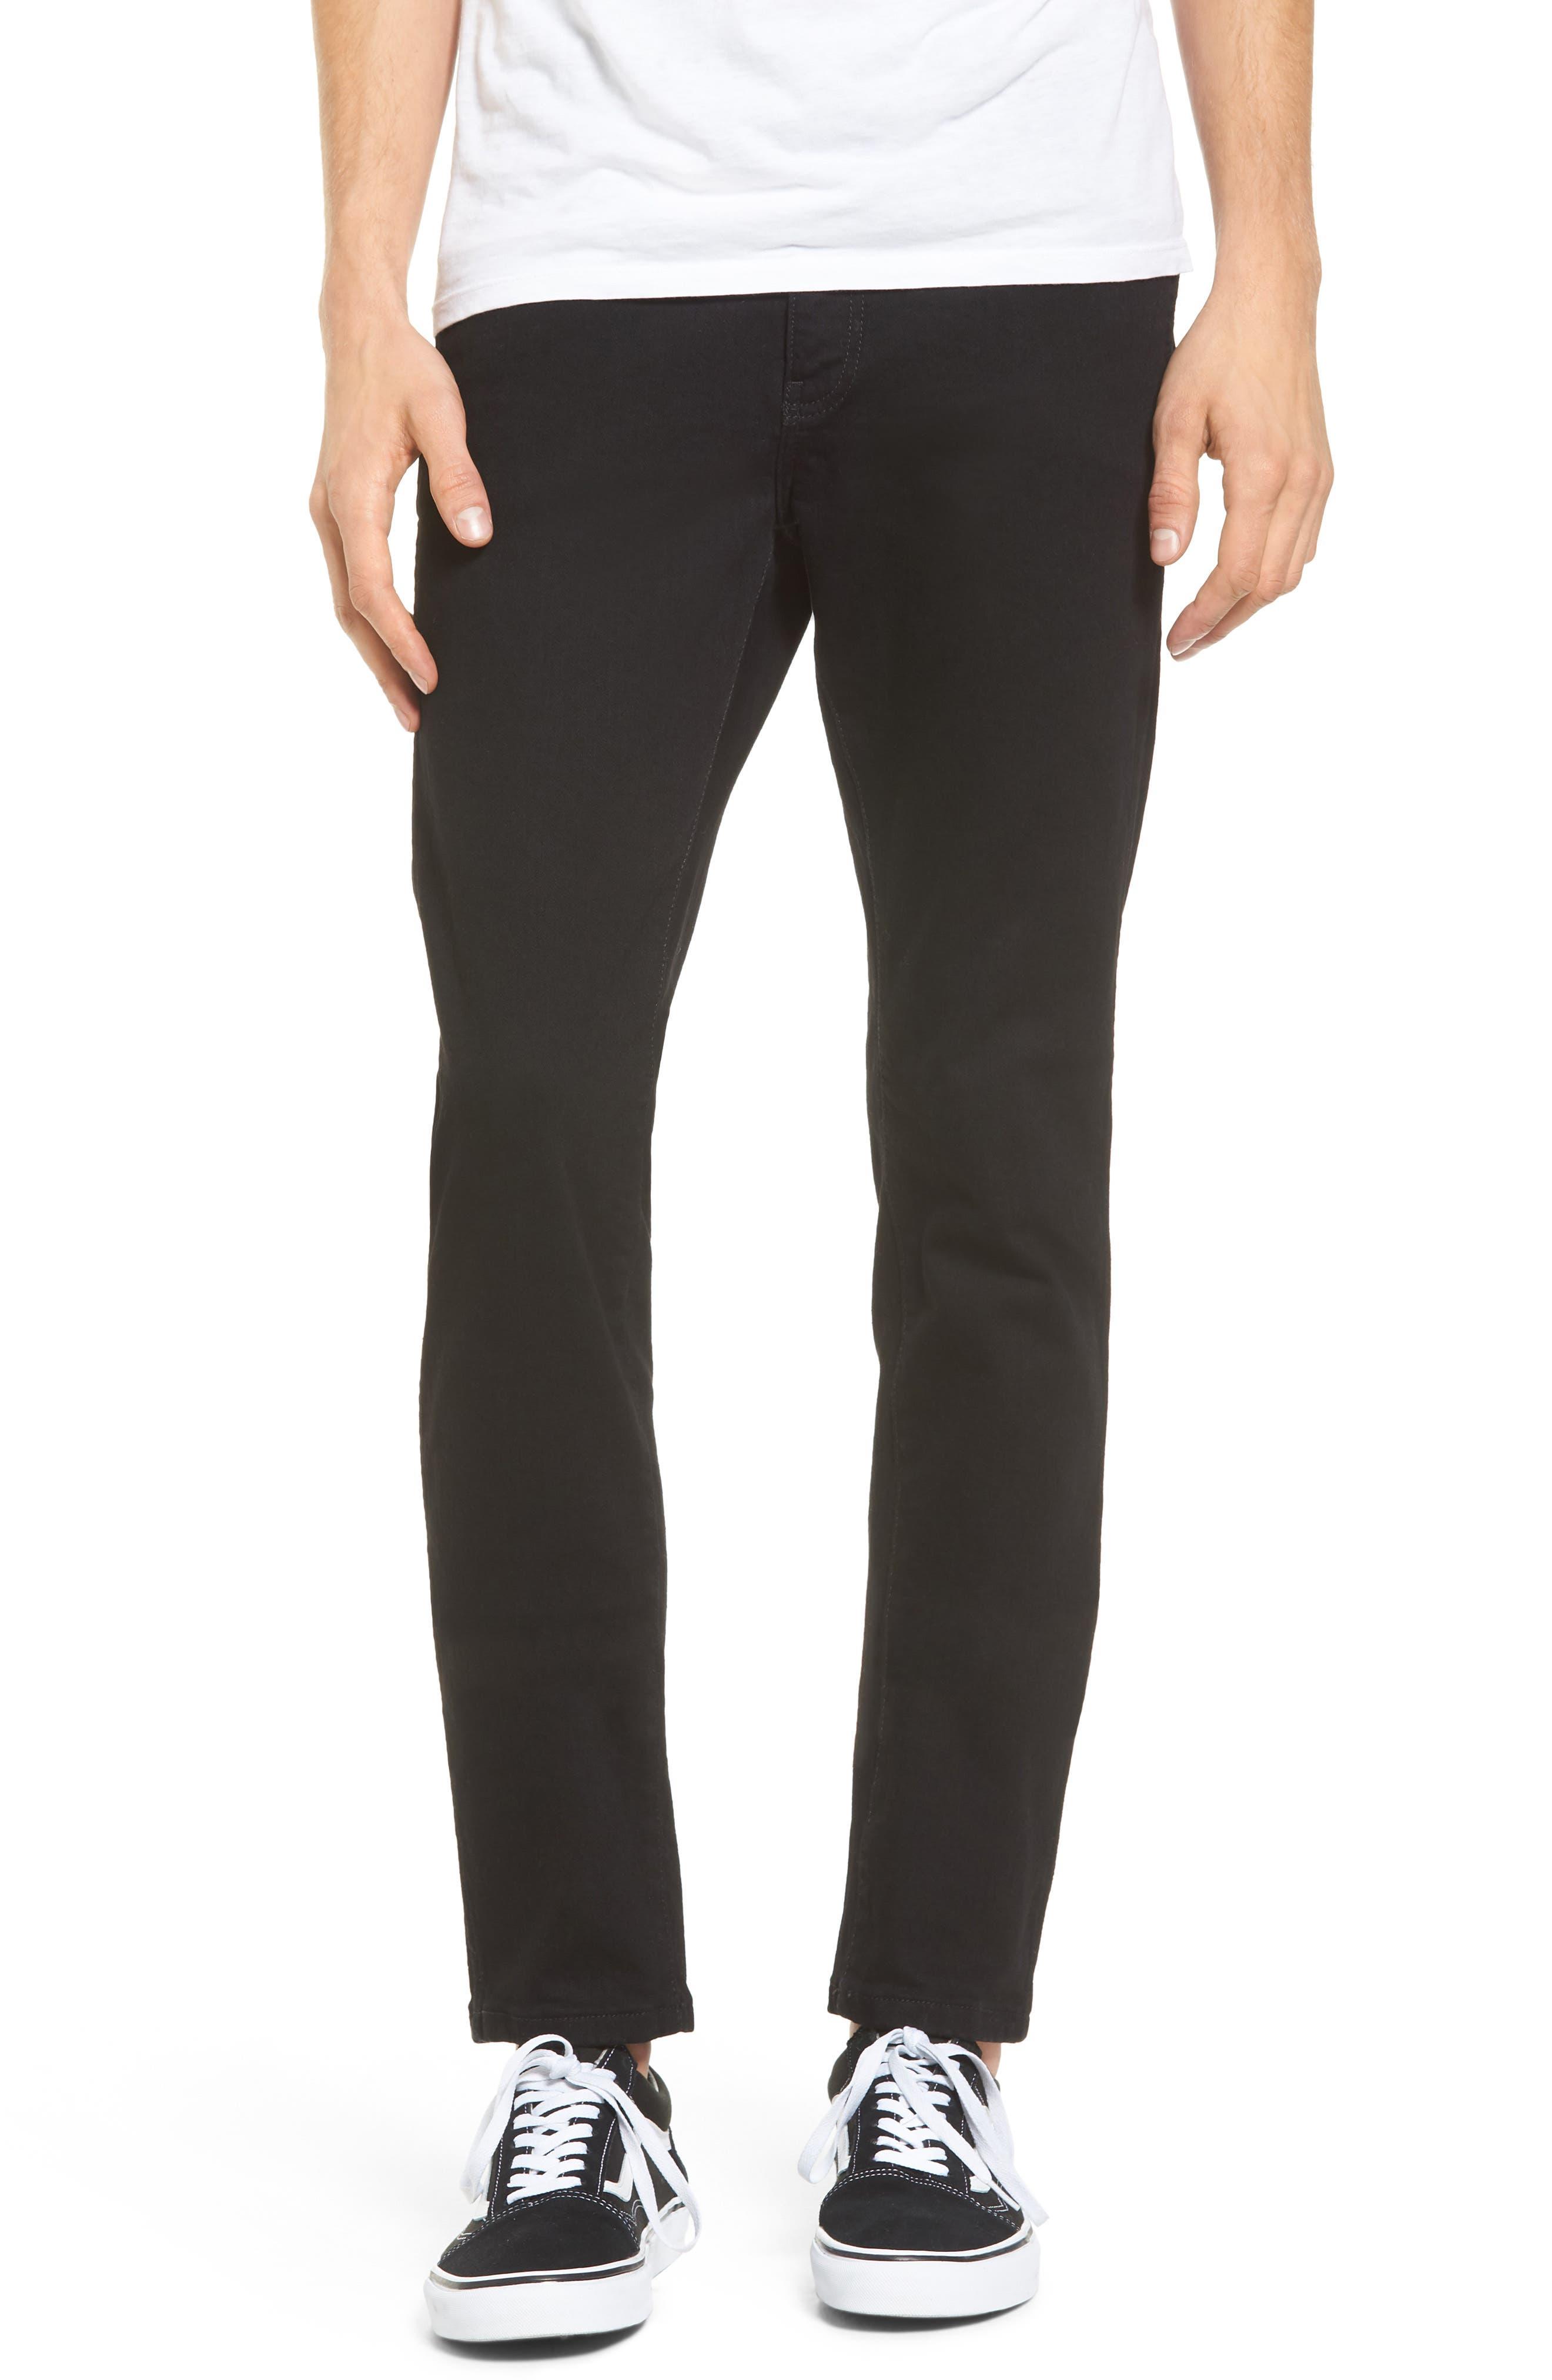 Snap Skinny Fit Jeans,                         Main,                         color, Organic Black